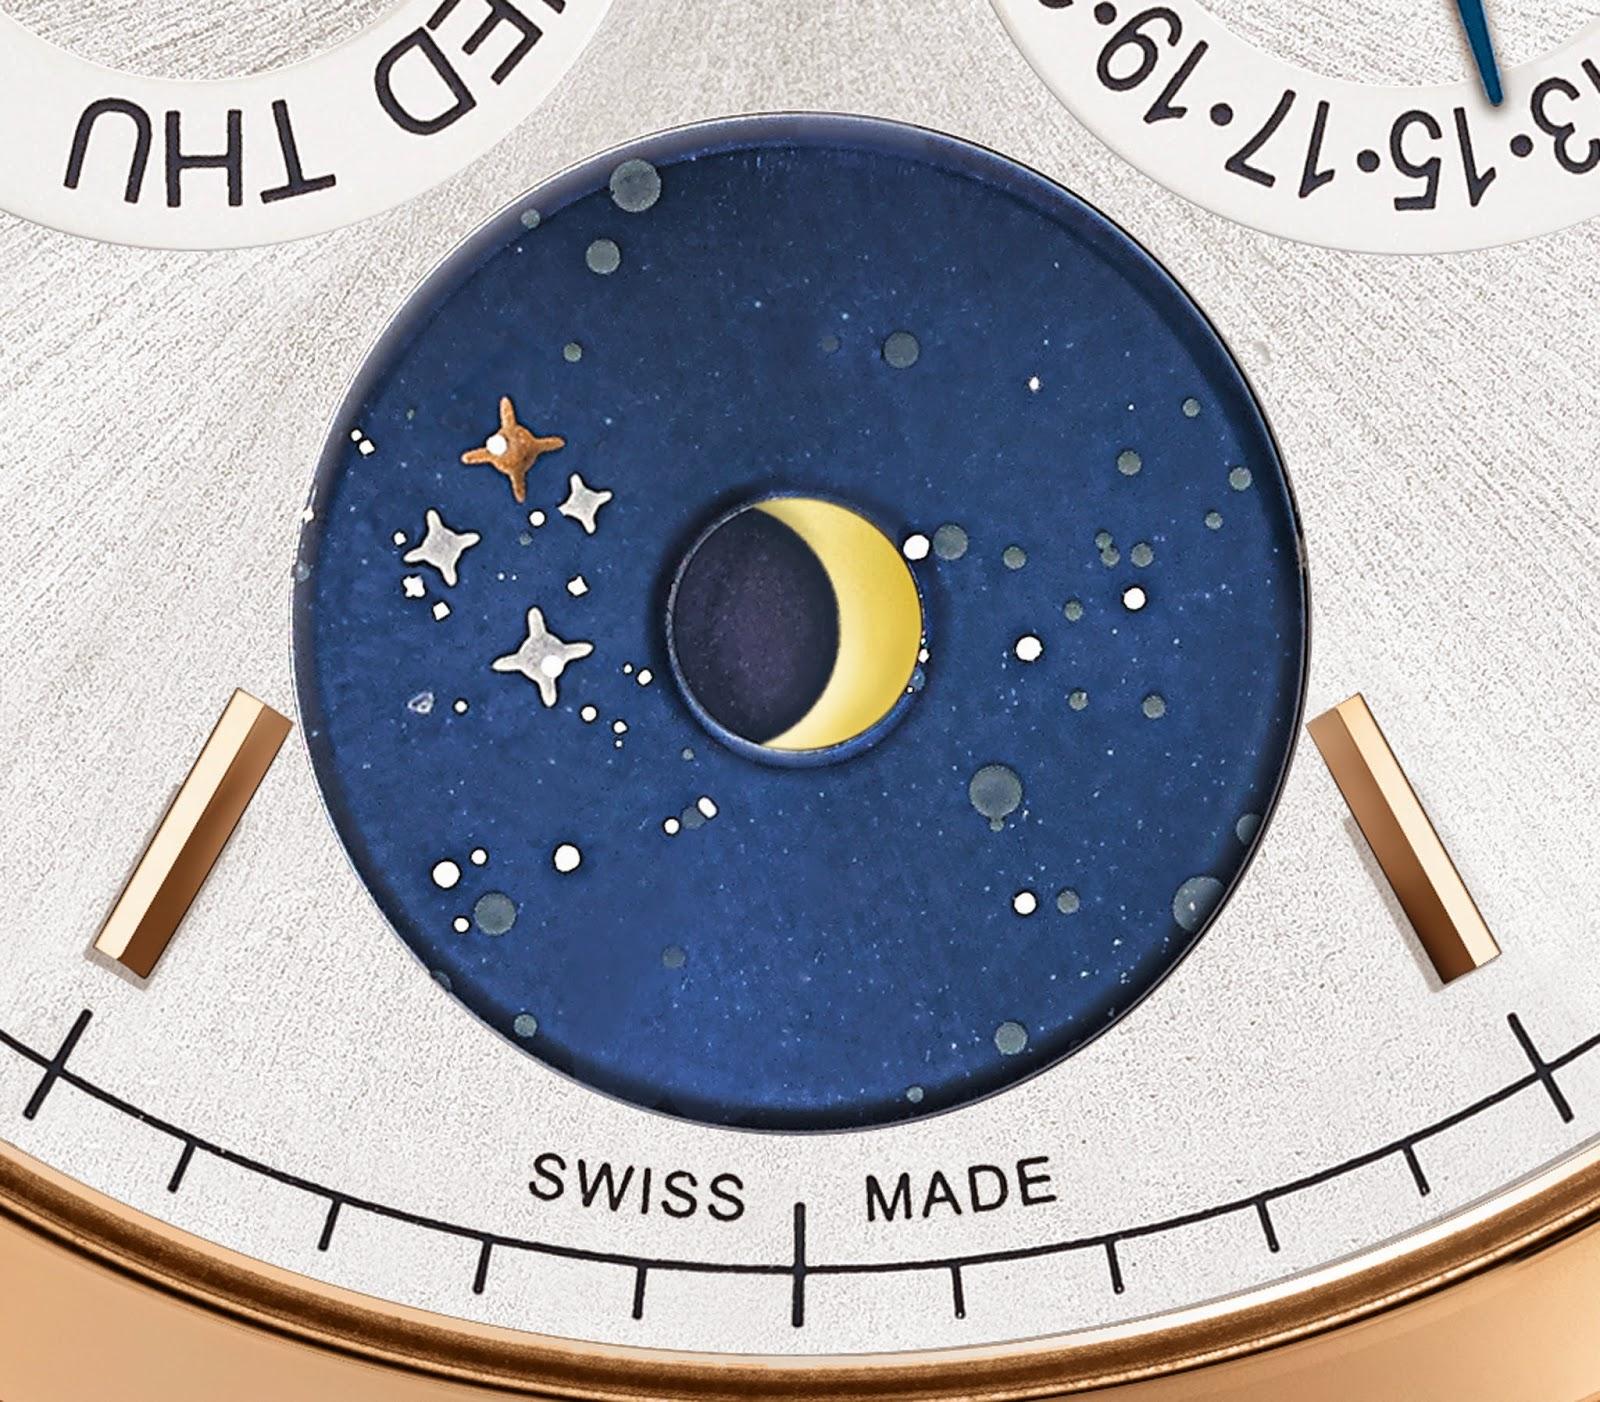 Montblanc Heritage Chronométrie debajodelreloj15